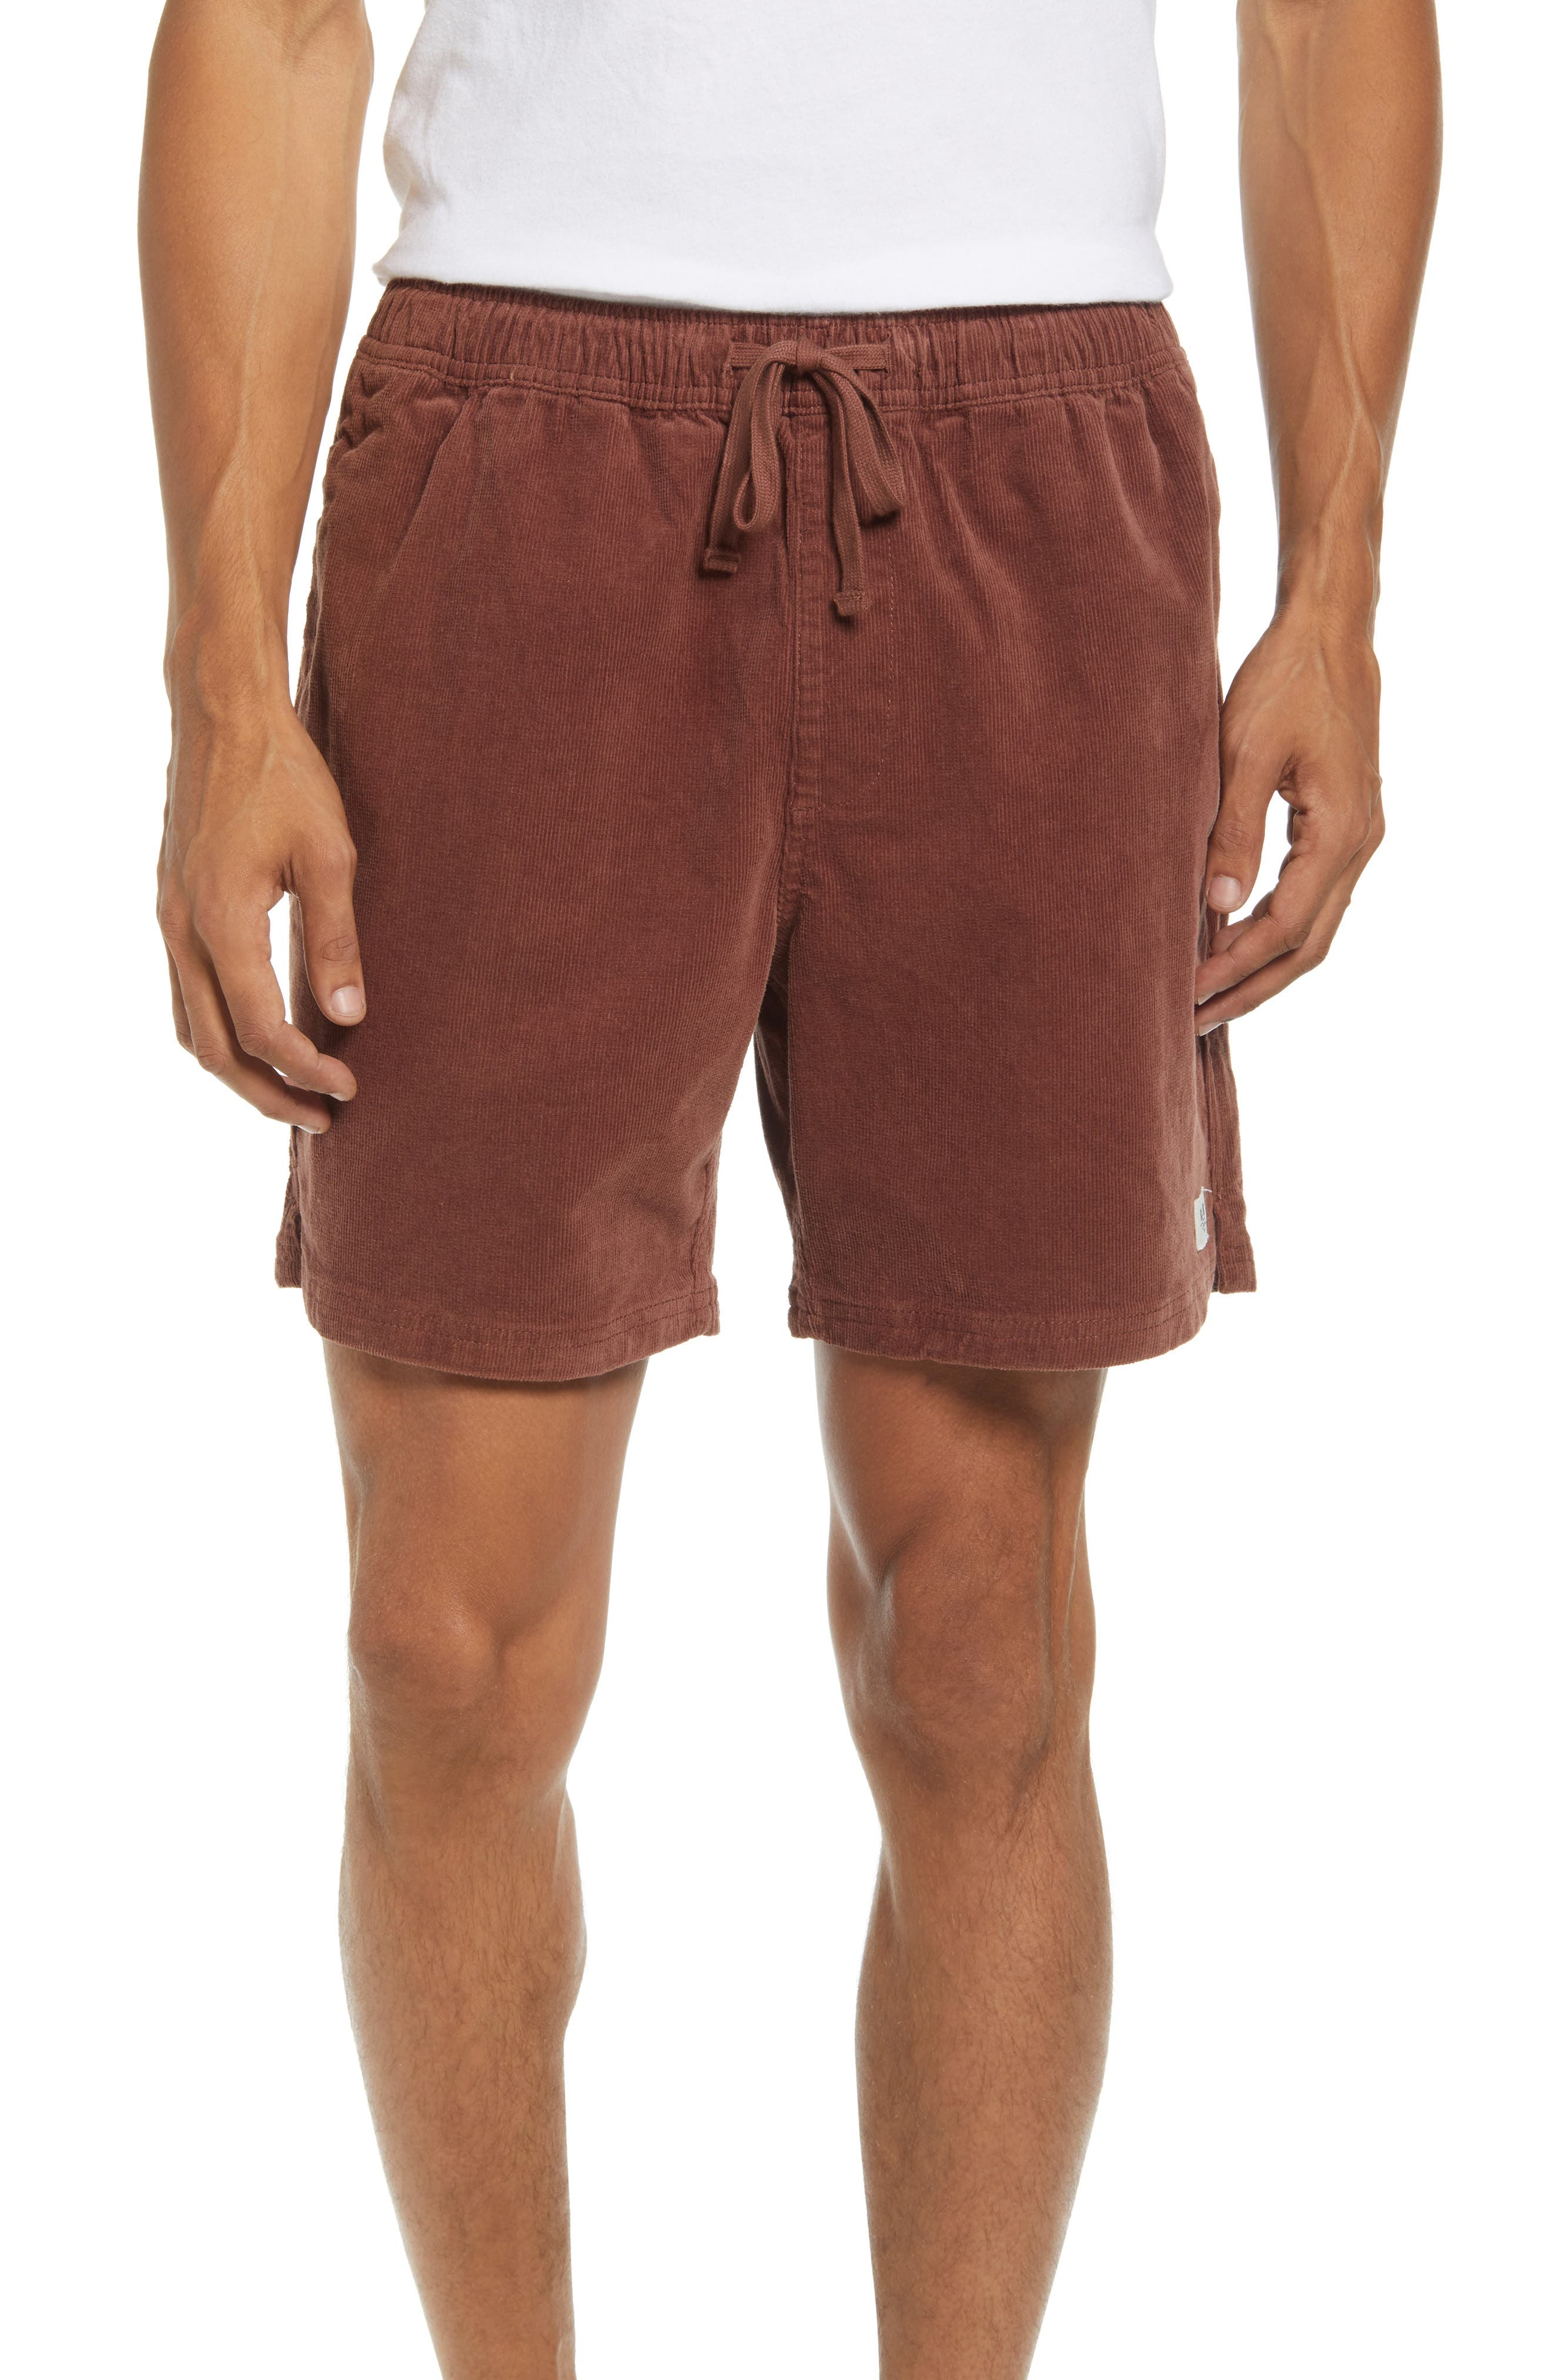 Local Corduroy Walking Shorts